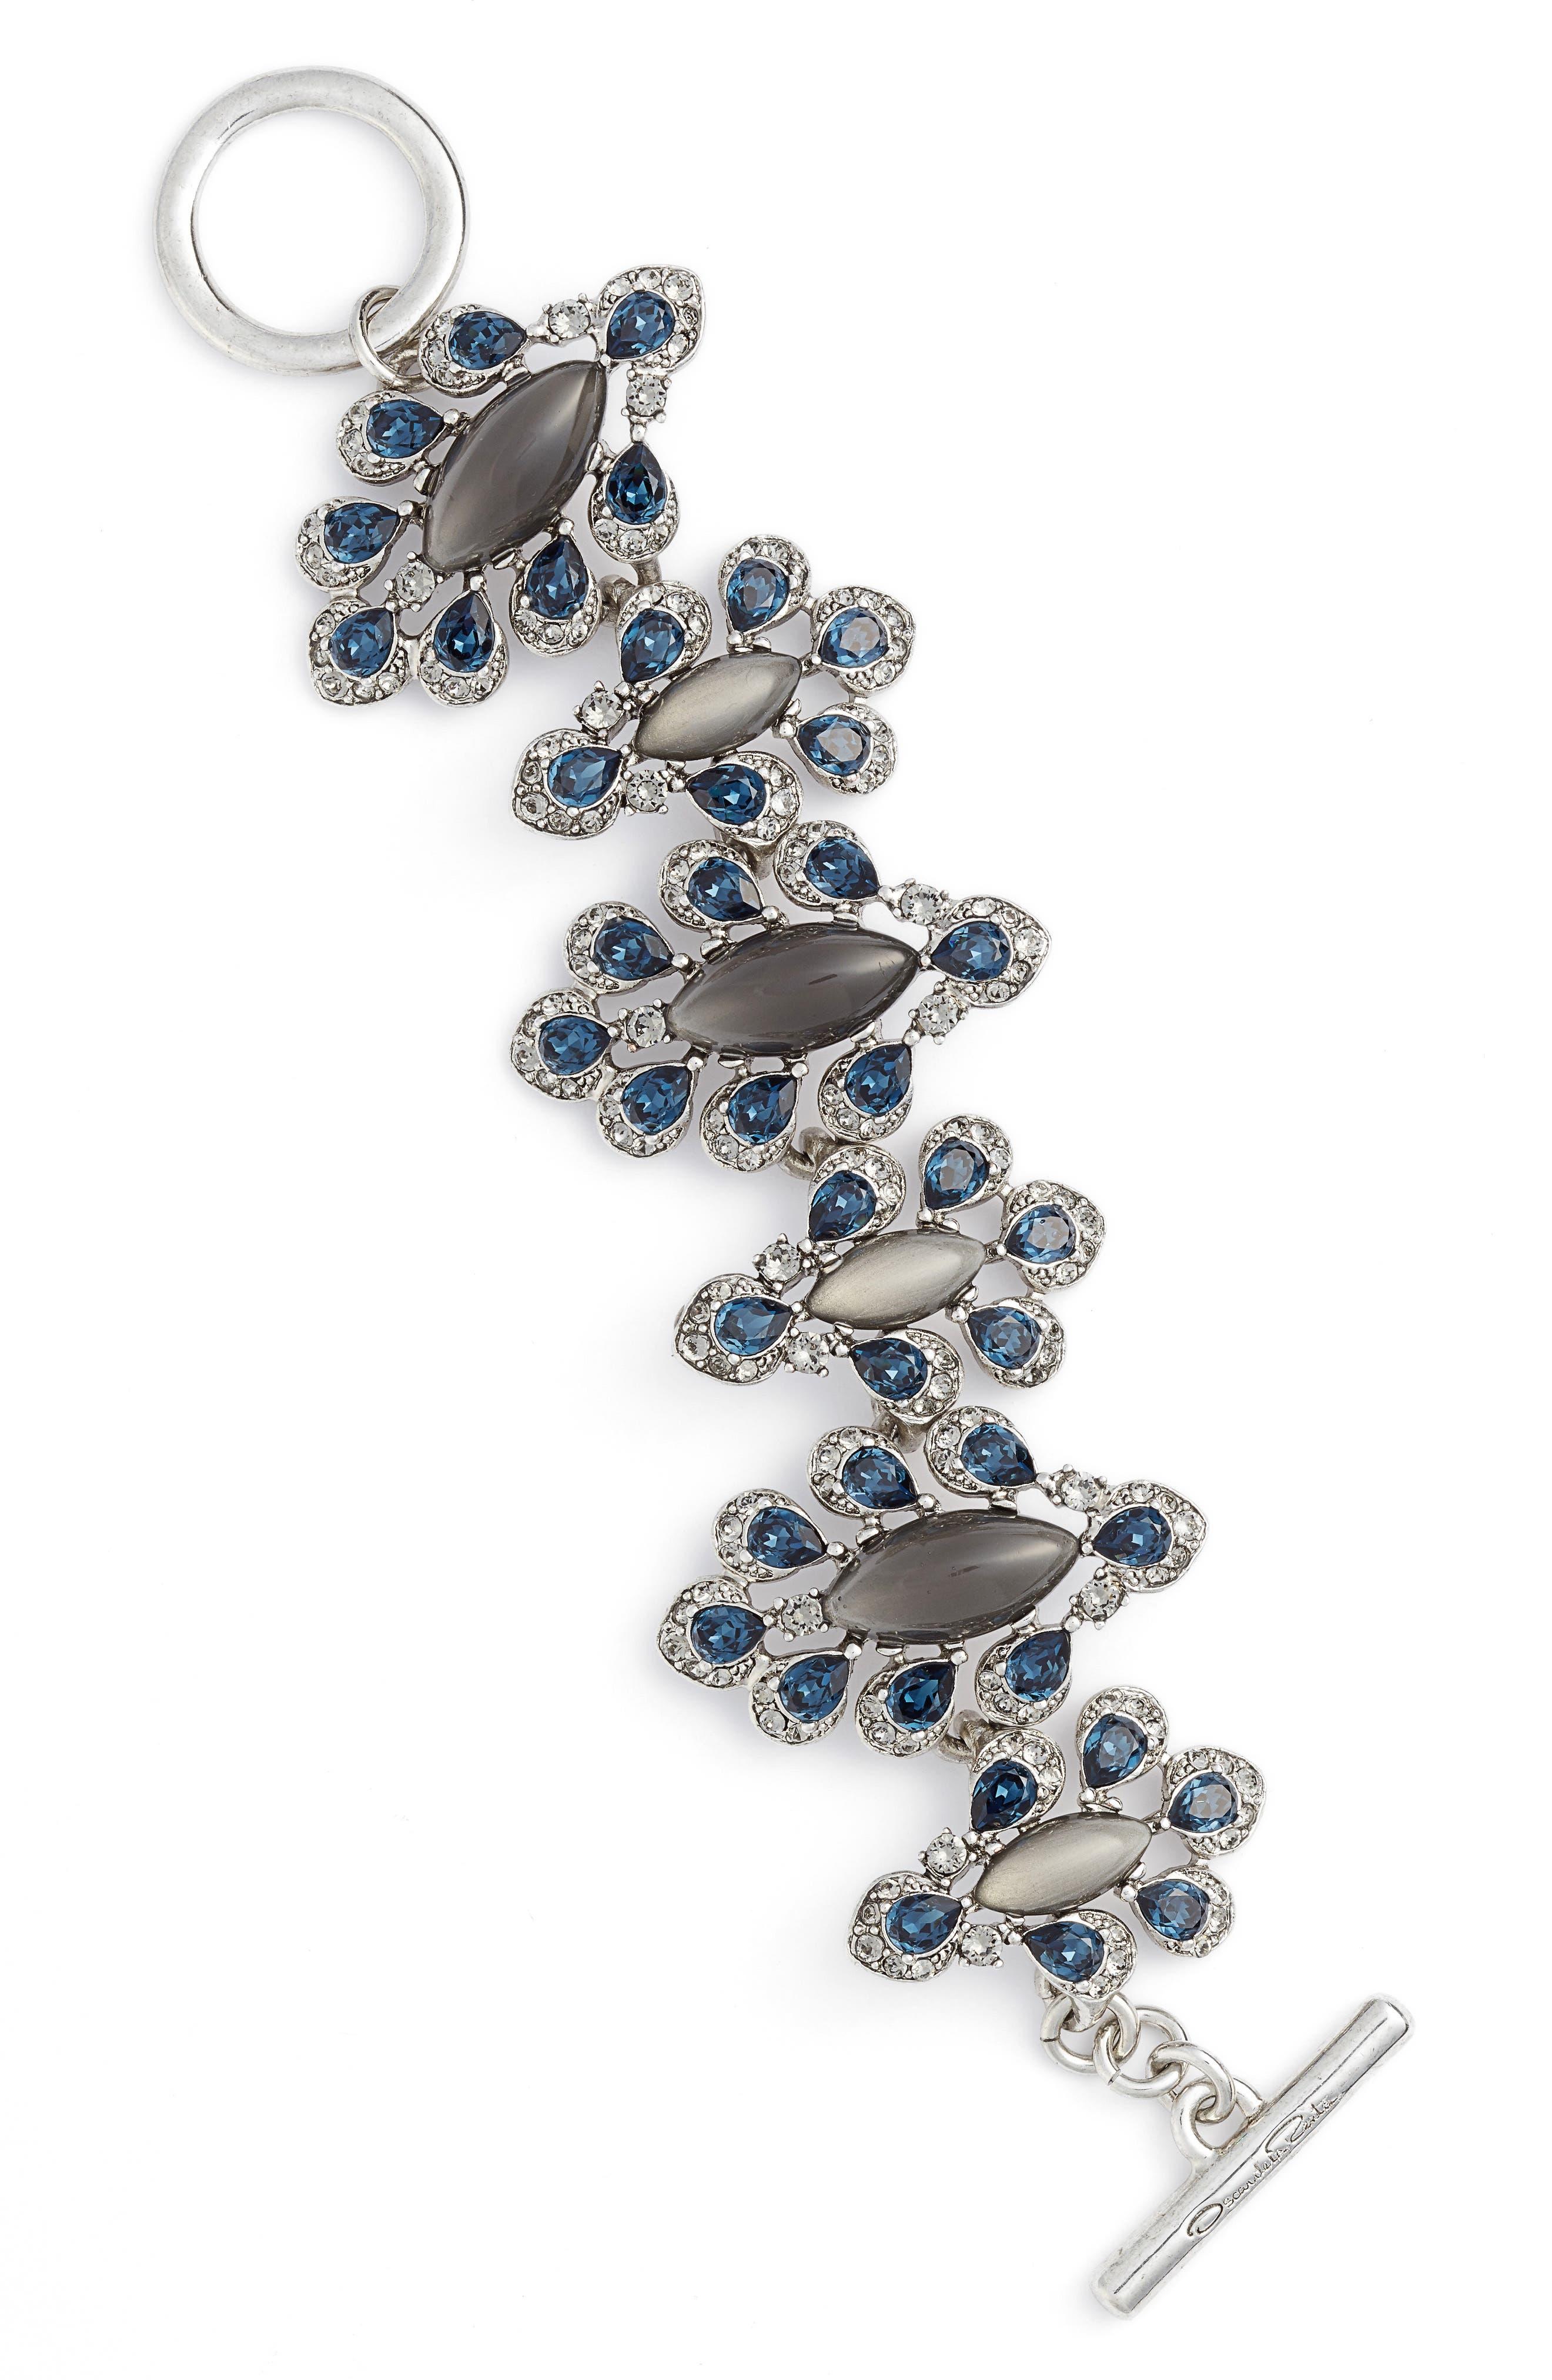 Alternate Image 1 Selected - Oscar de la Renta Parlor Swarovski Crystal Bracelet